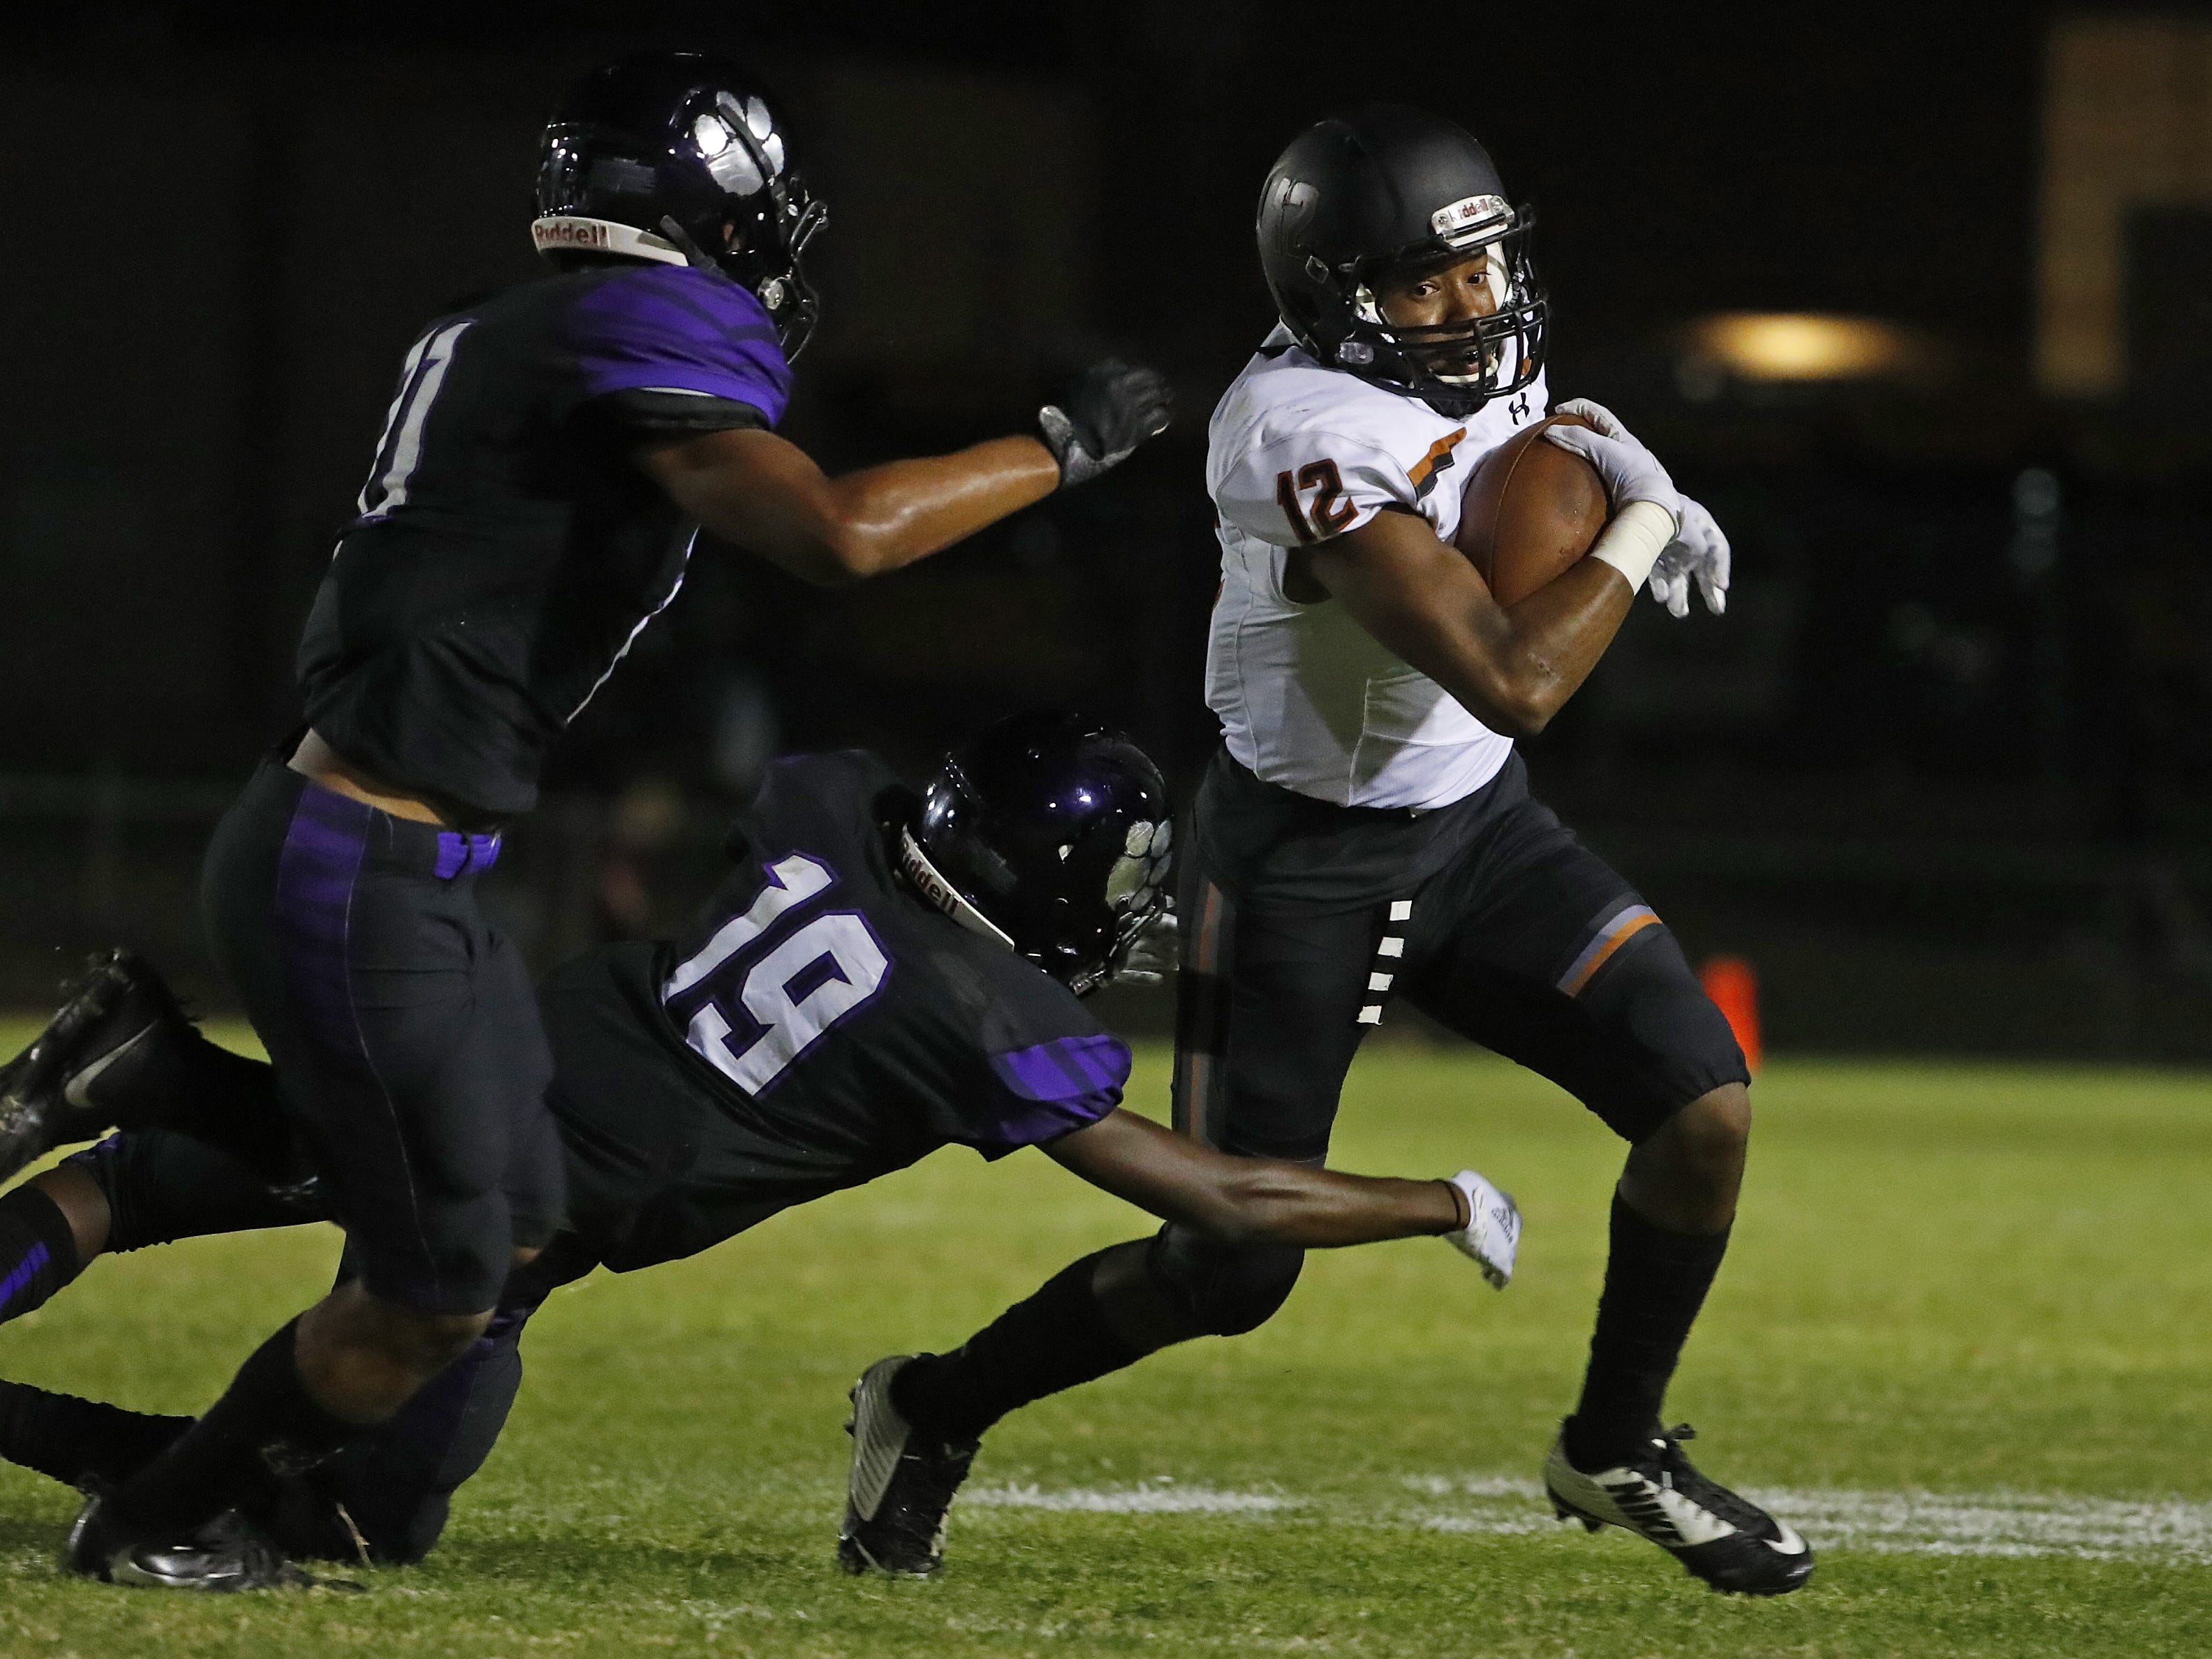 Desert Edge's Kennith Powell (12) breaks tackles from Millennium's Daylon Storey (11) and Kaysan Barnett (19) during a game at Millennium High School in Goodyear, Ariz. on Sept. 7, 2018.